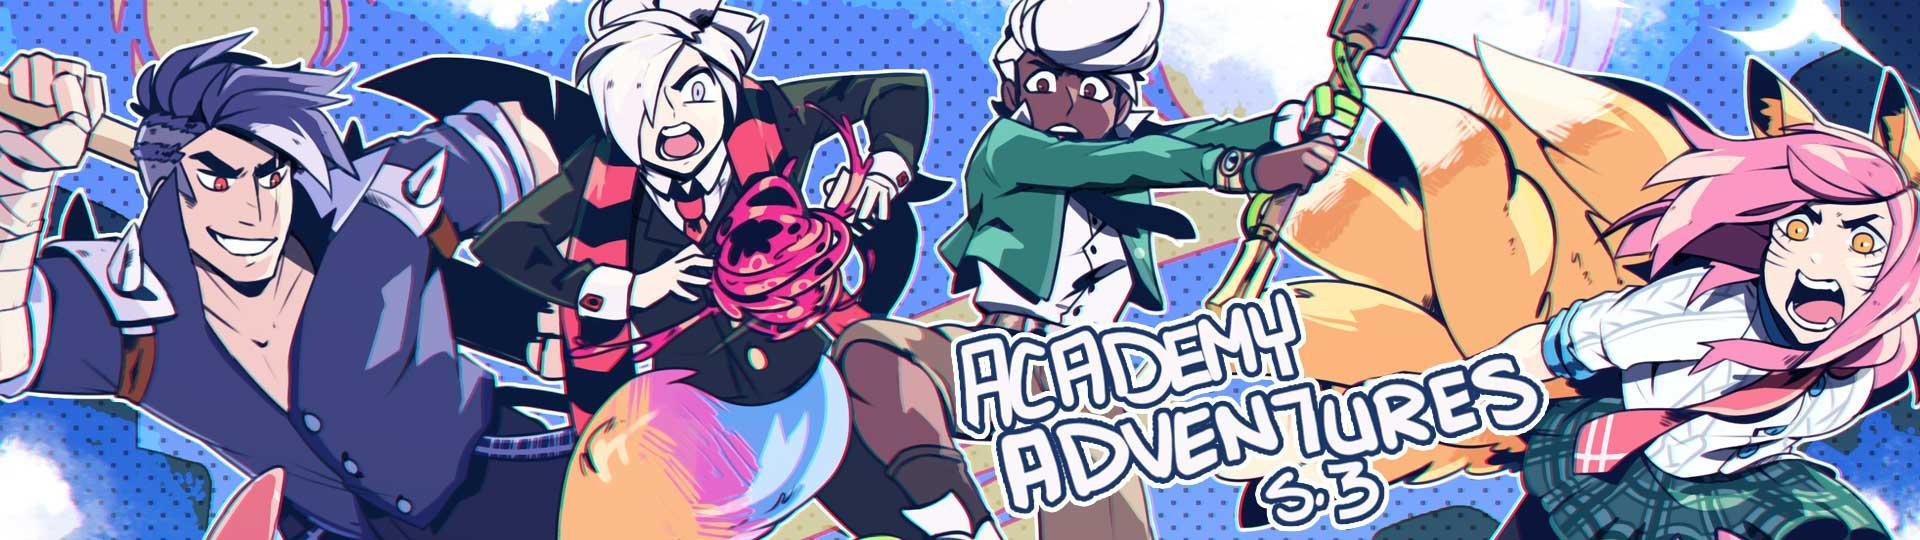 Academy Adventures 3 League Of Legends